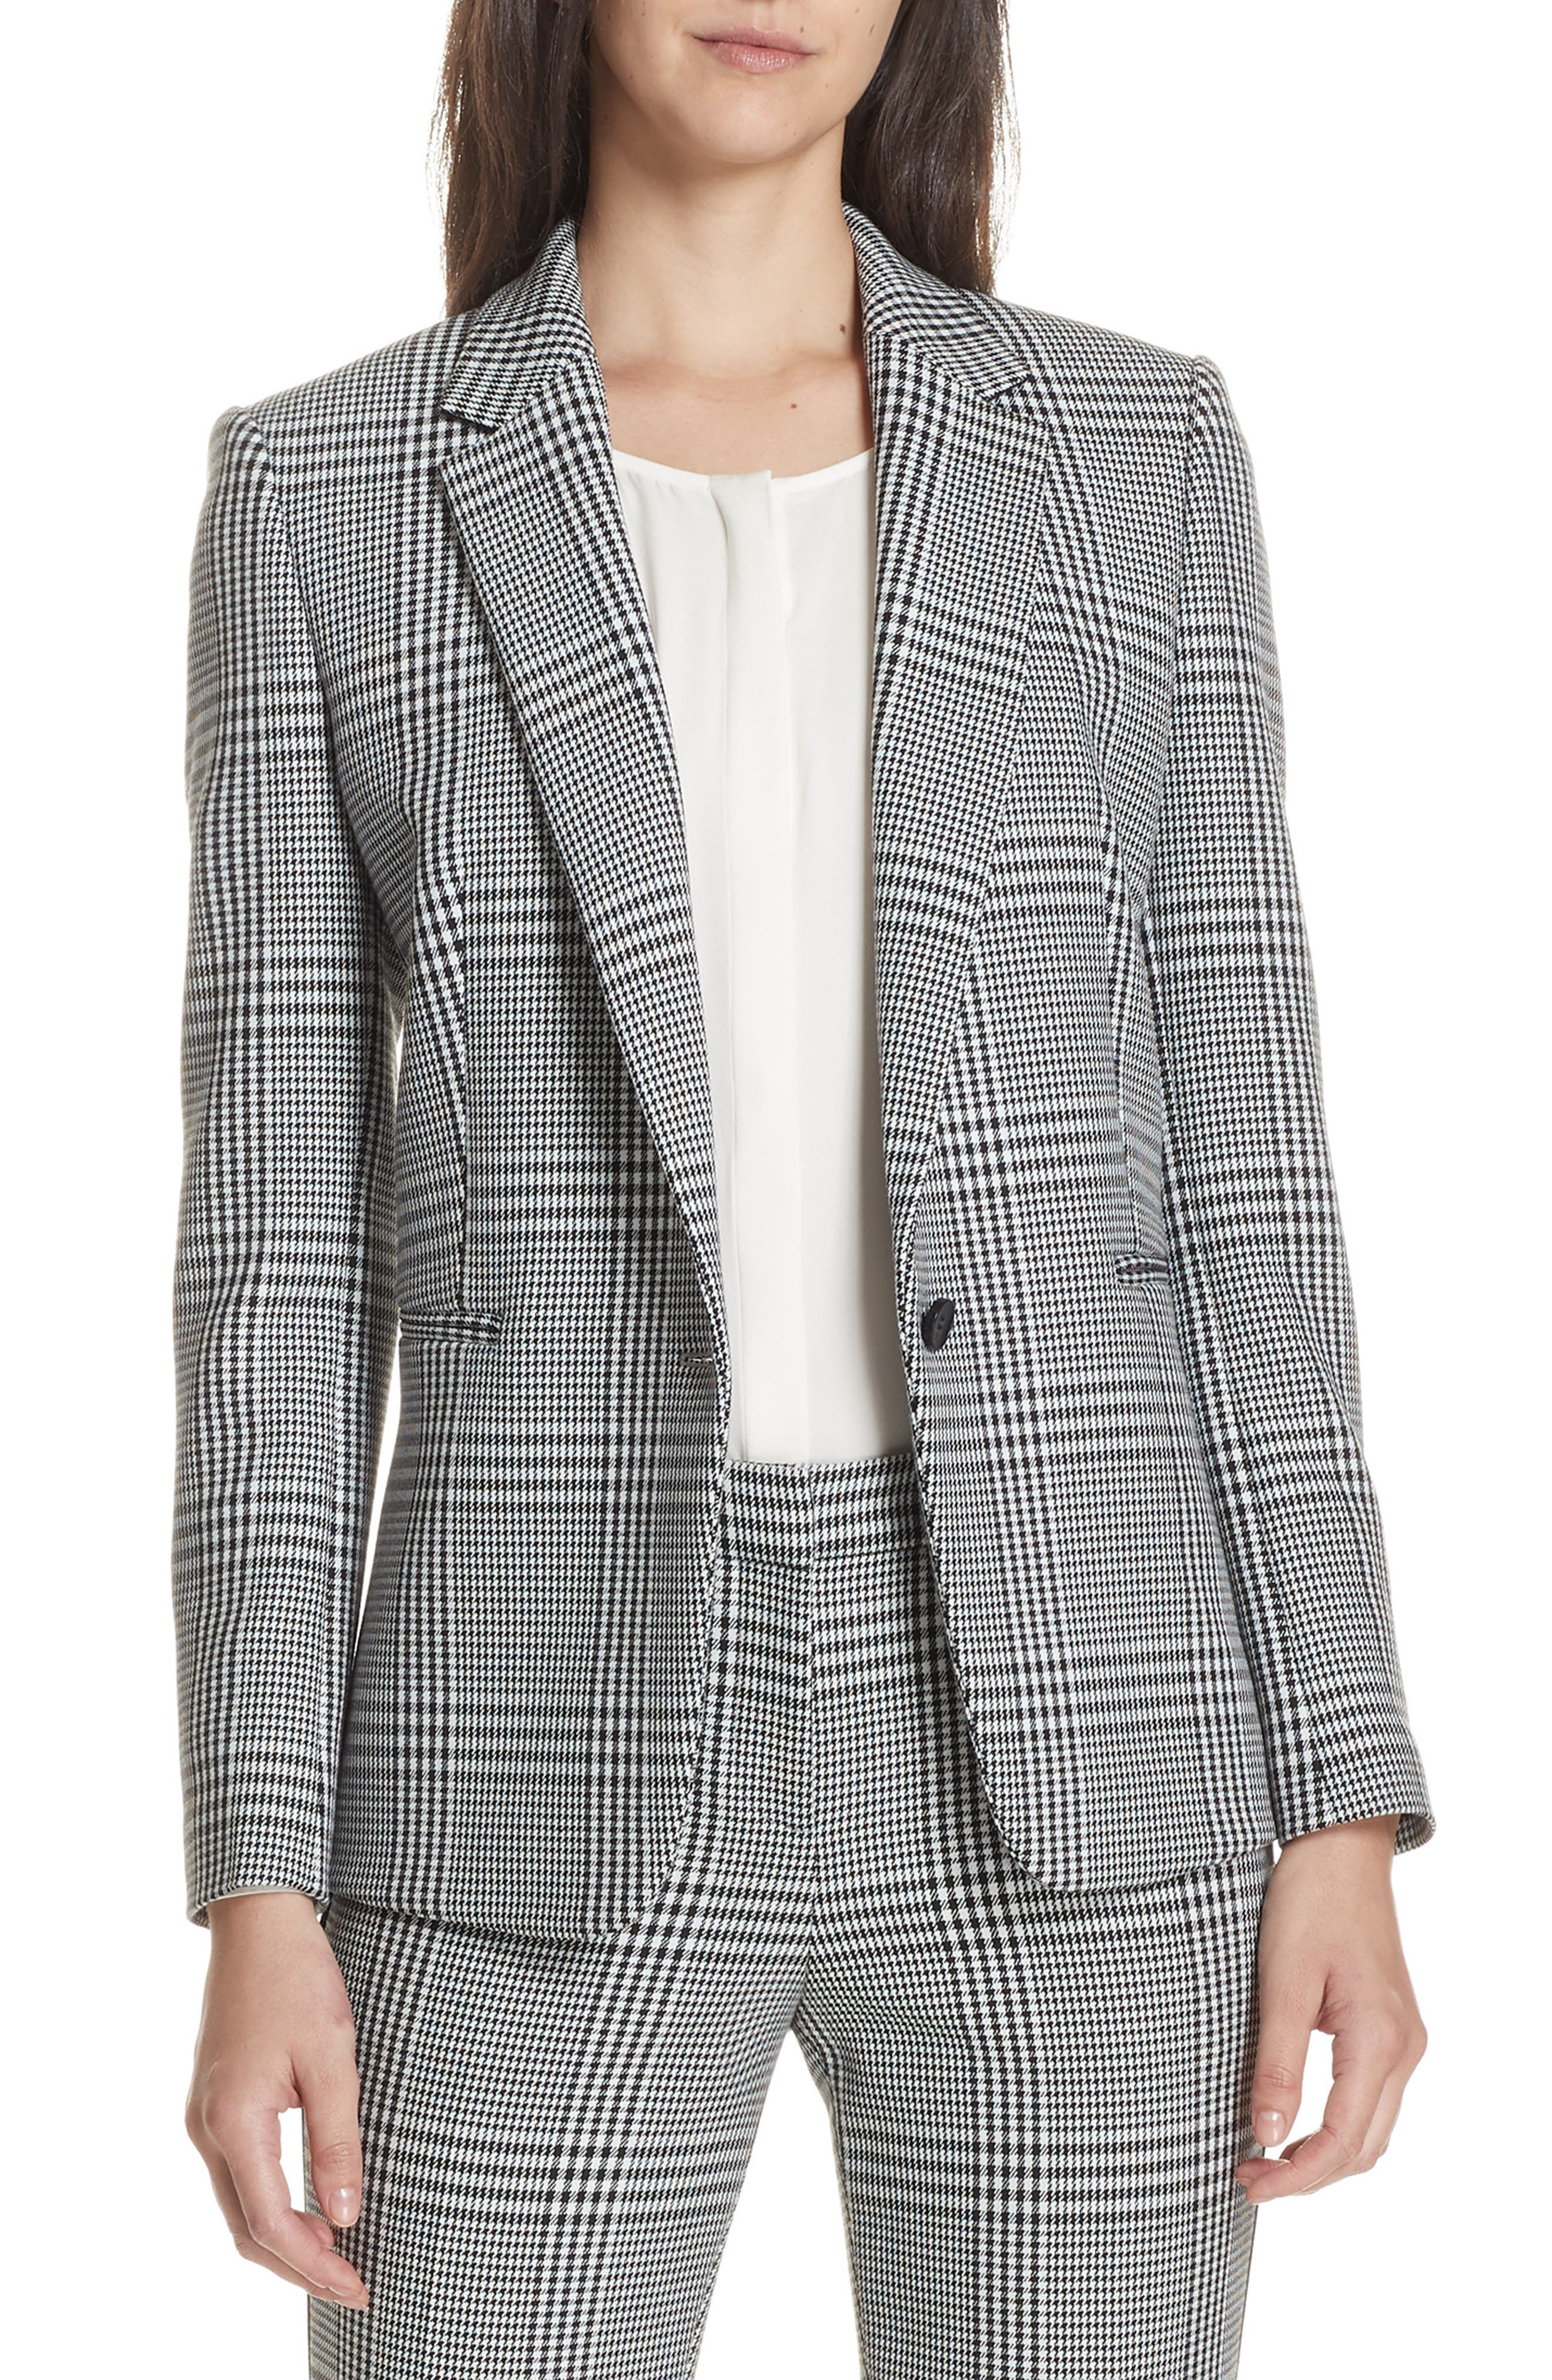 Jemaromina Glen Plaid Suit Jacket,                             Main thumbnail 1, color,                             GLENCHECK FANTASY